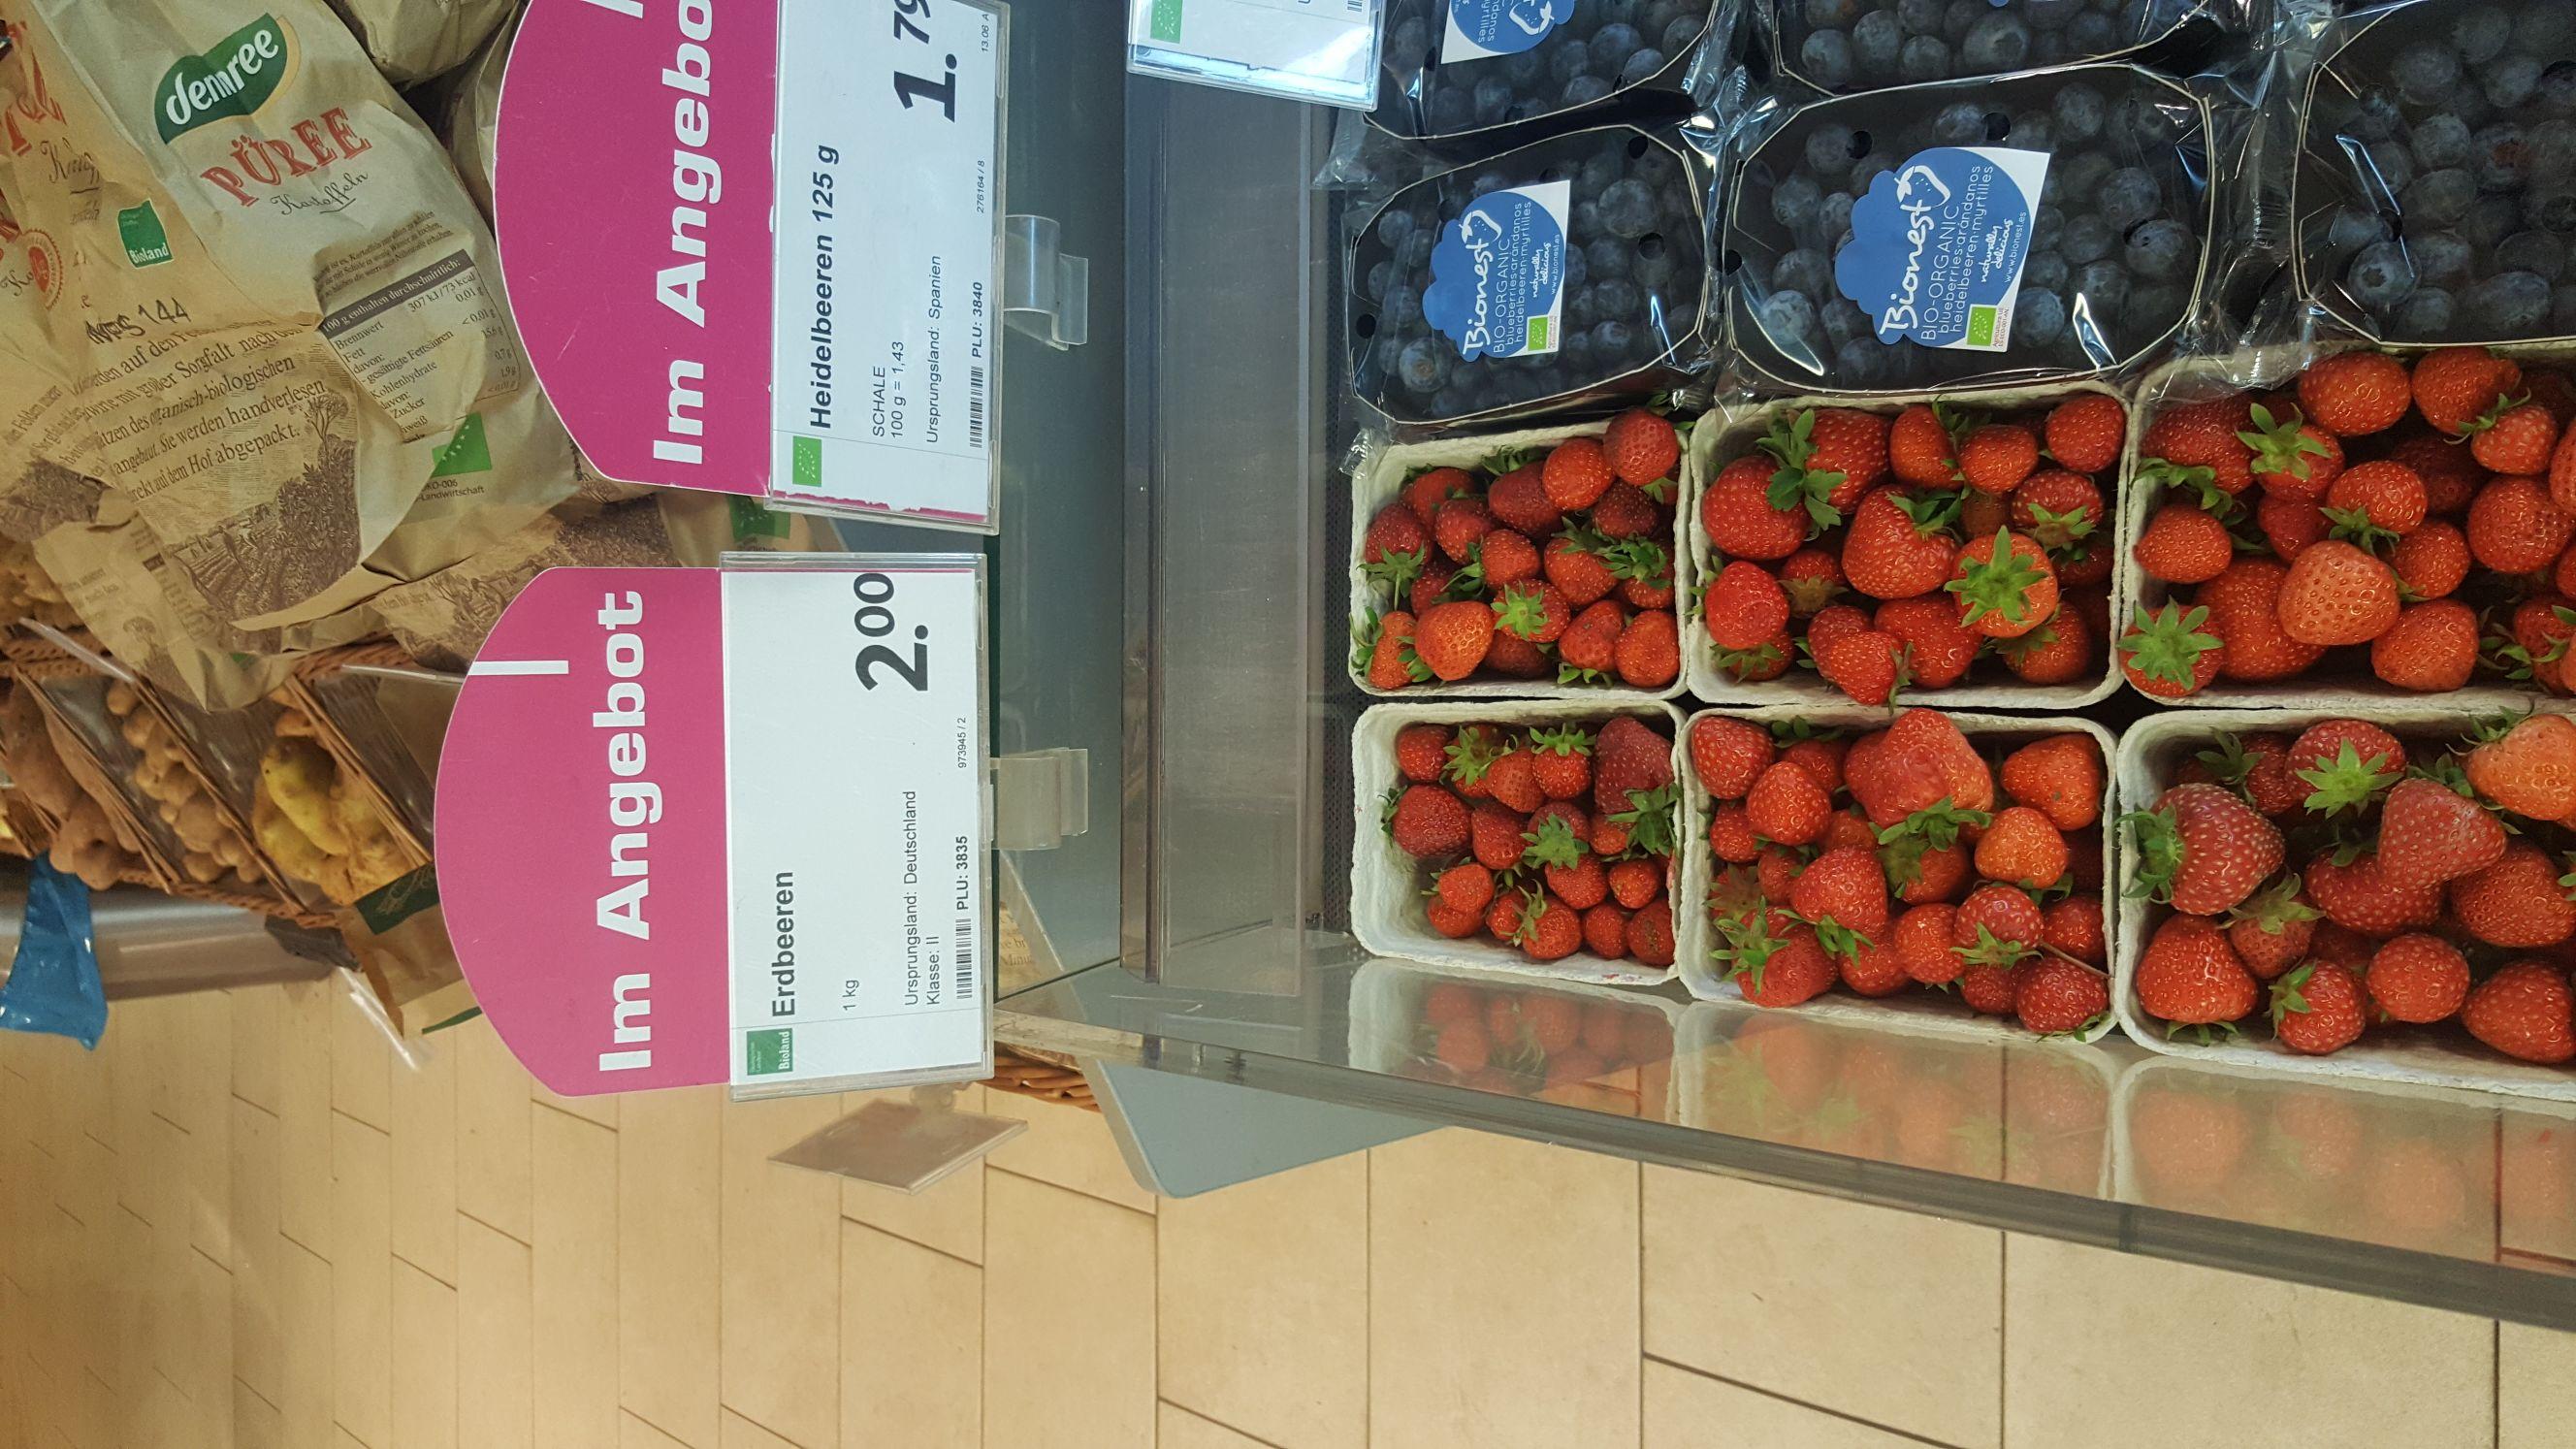 [lokal Hamburg bergedorf] Bio Erdbeeren 2€/Kilo bei Denns